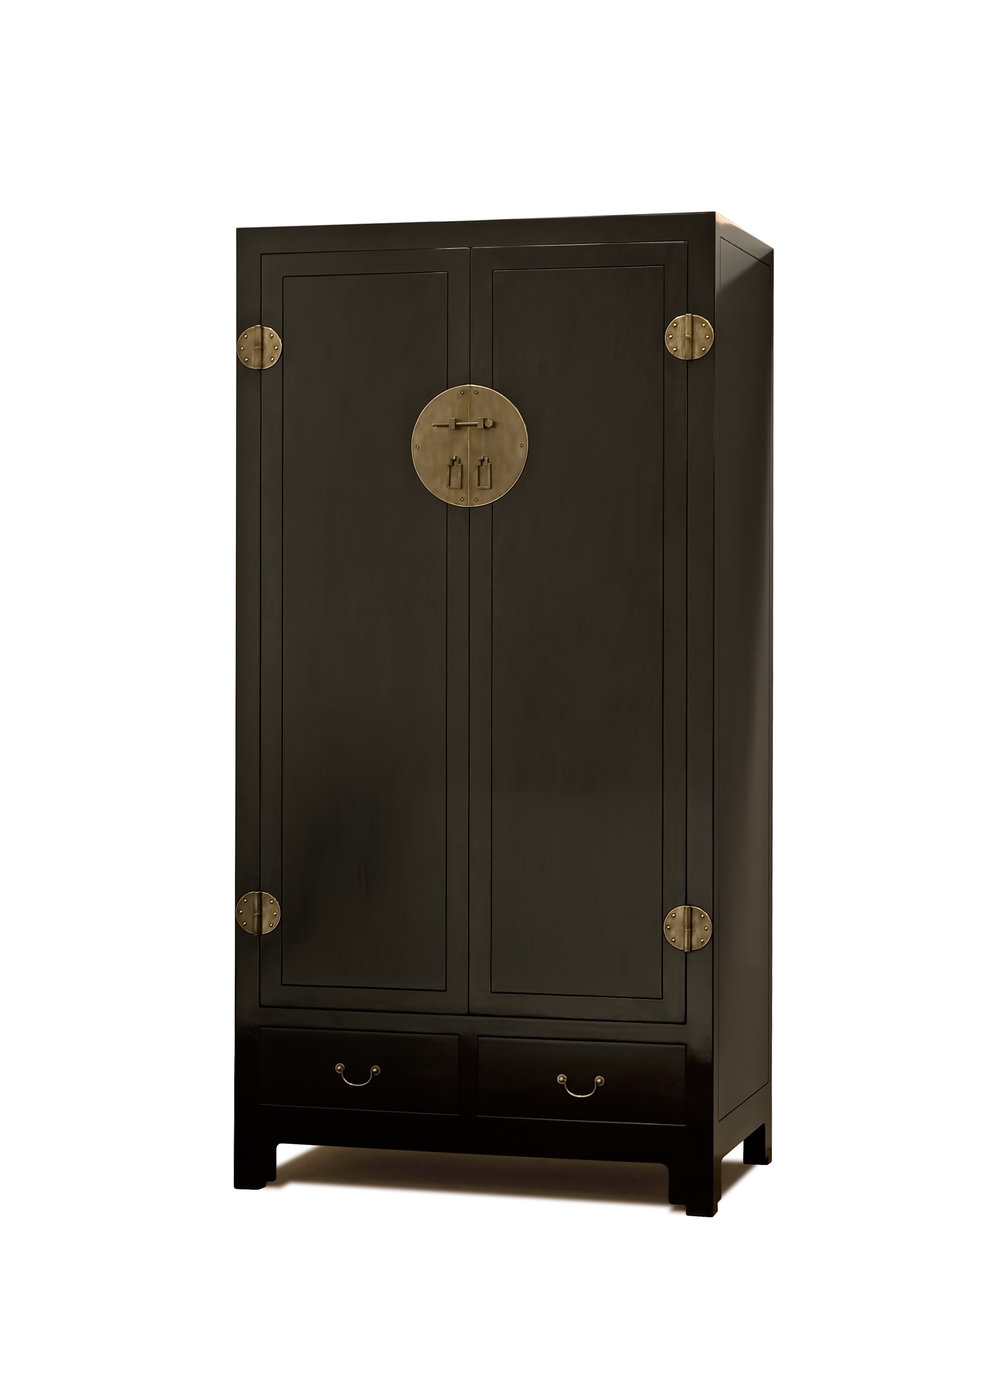 ....chinese ming style furniture : wardrobe ..中式明诗家具 : 衣柜....